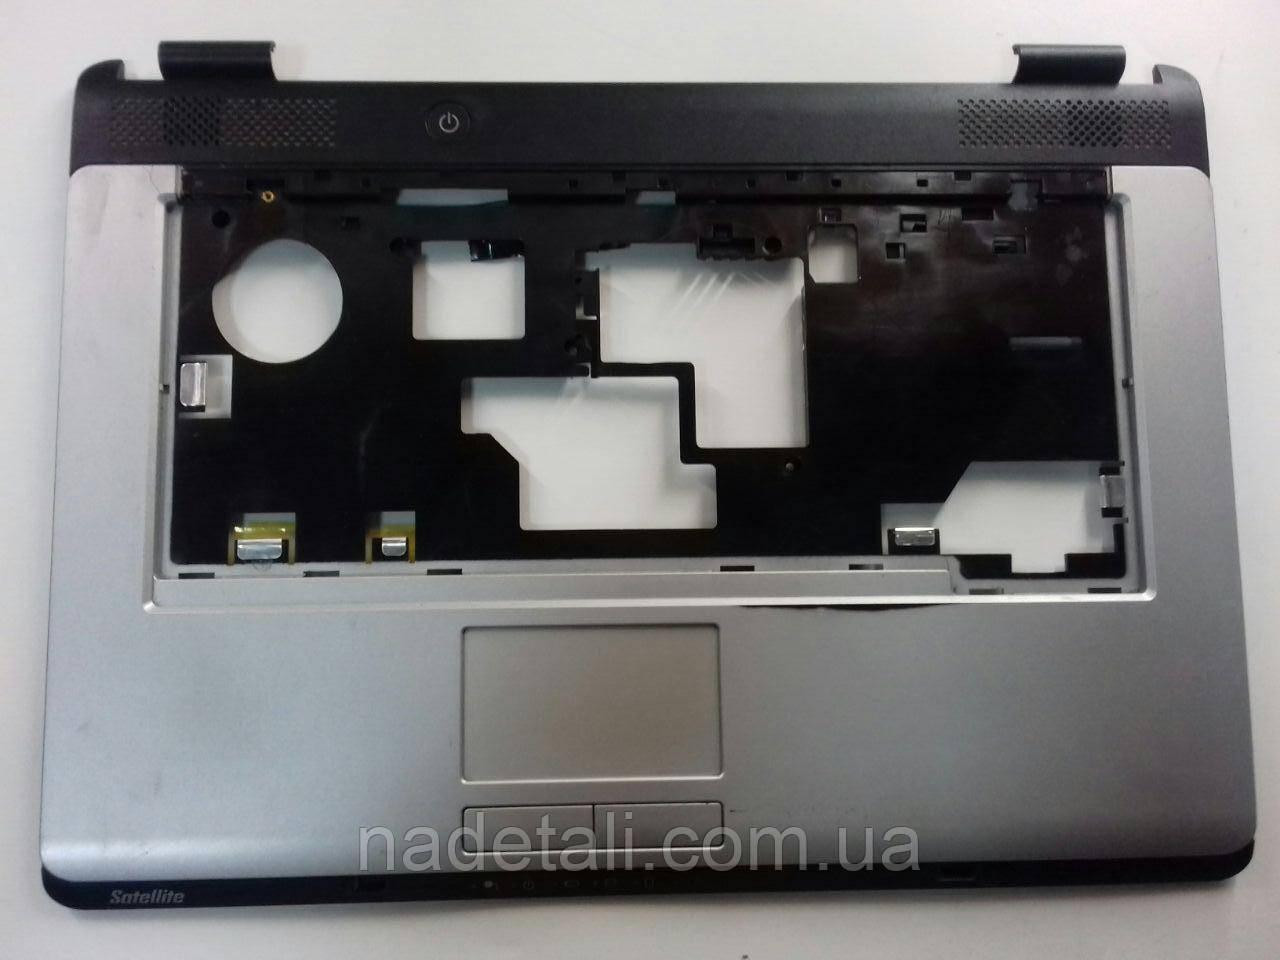 Верхняя часть Toshiba Satellite L300-V000130130